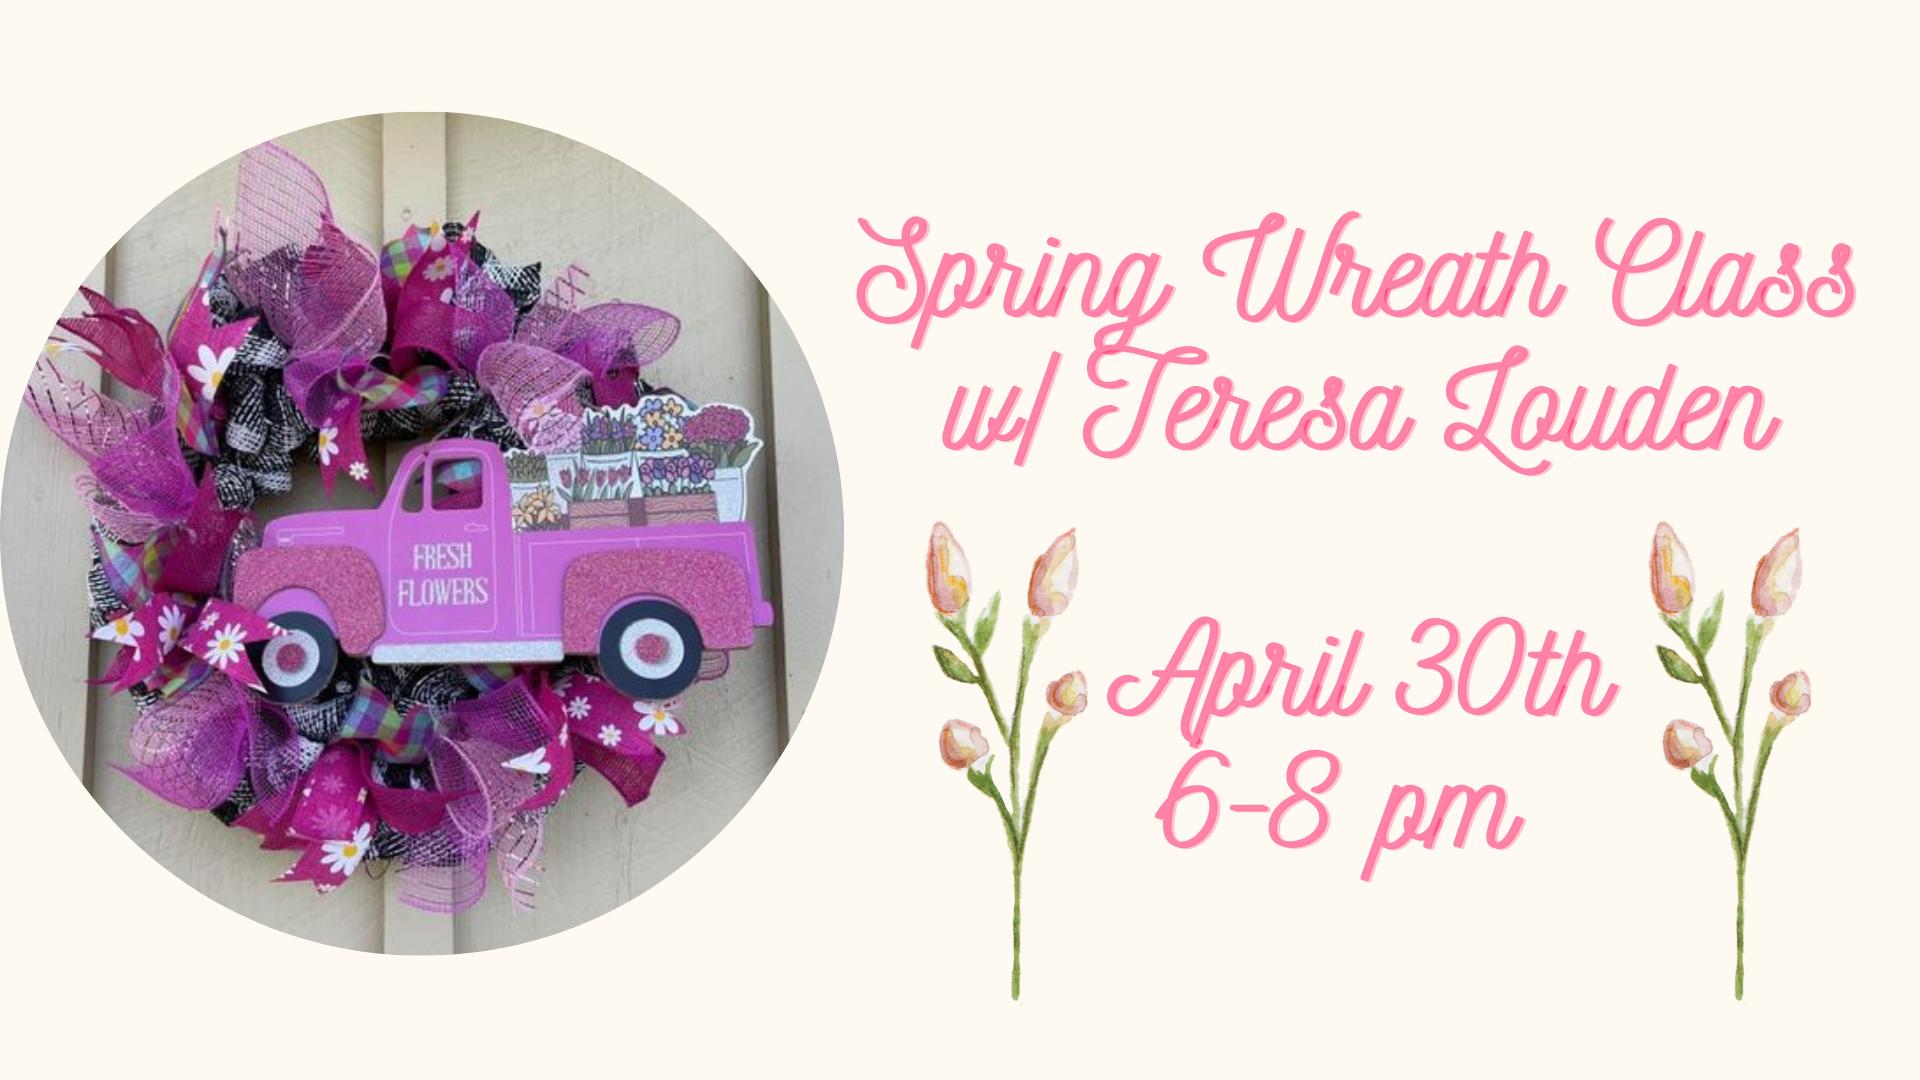 Spring Wreath Class w/ Teresa Louden